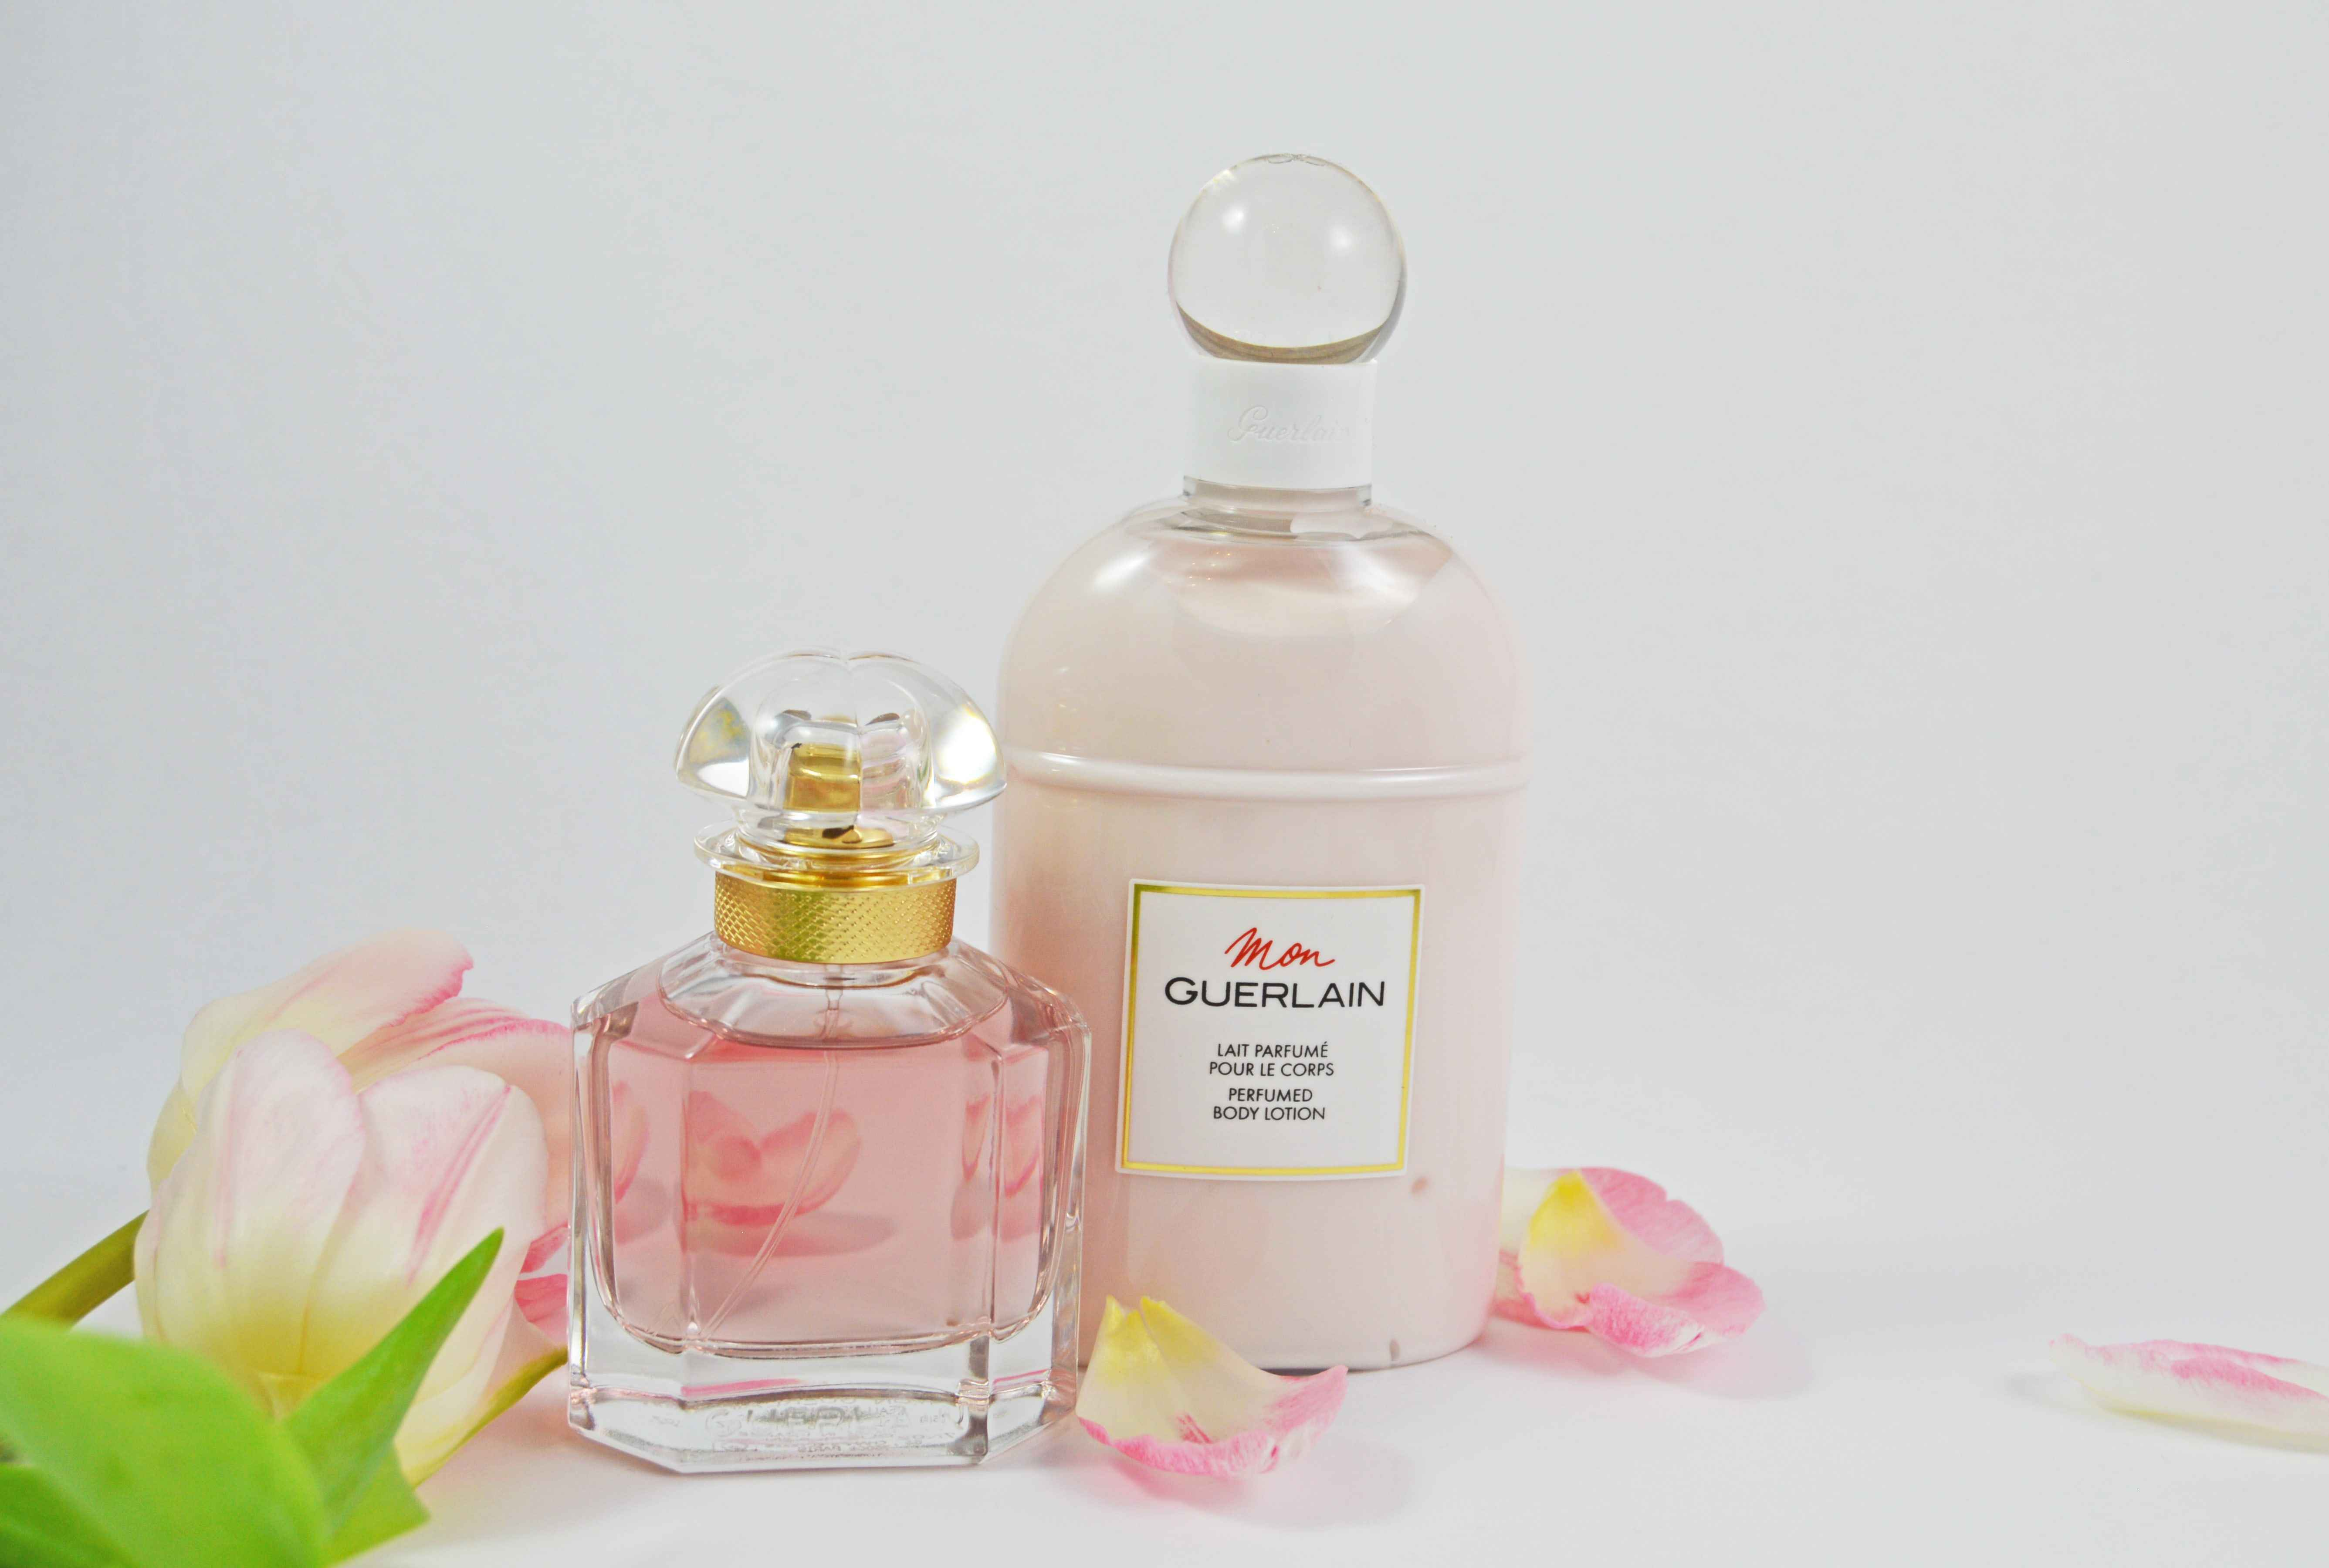 Guerlain Mon Guerlain Review